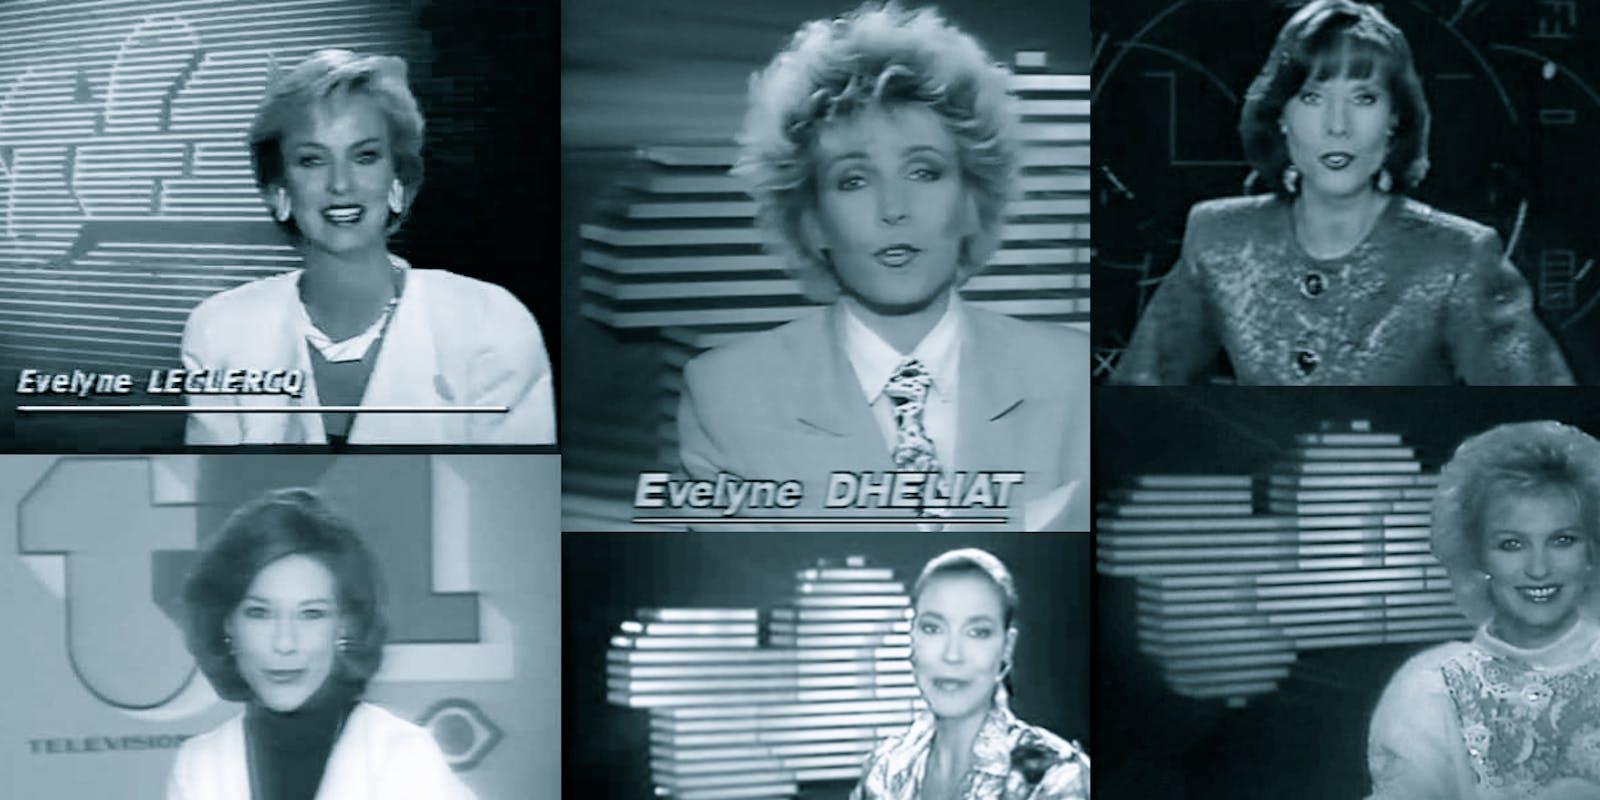 Les speakerines reprennent du service chez TF1